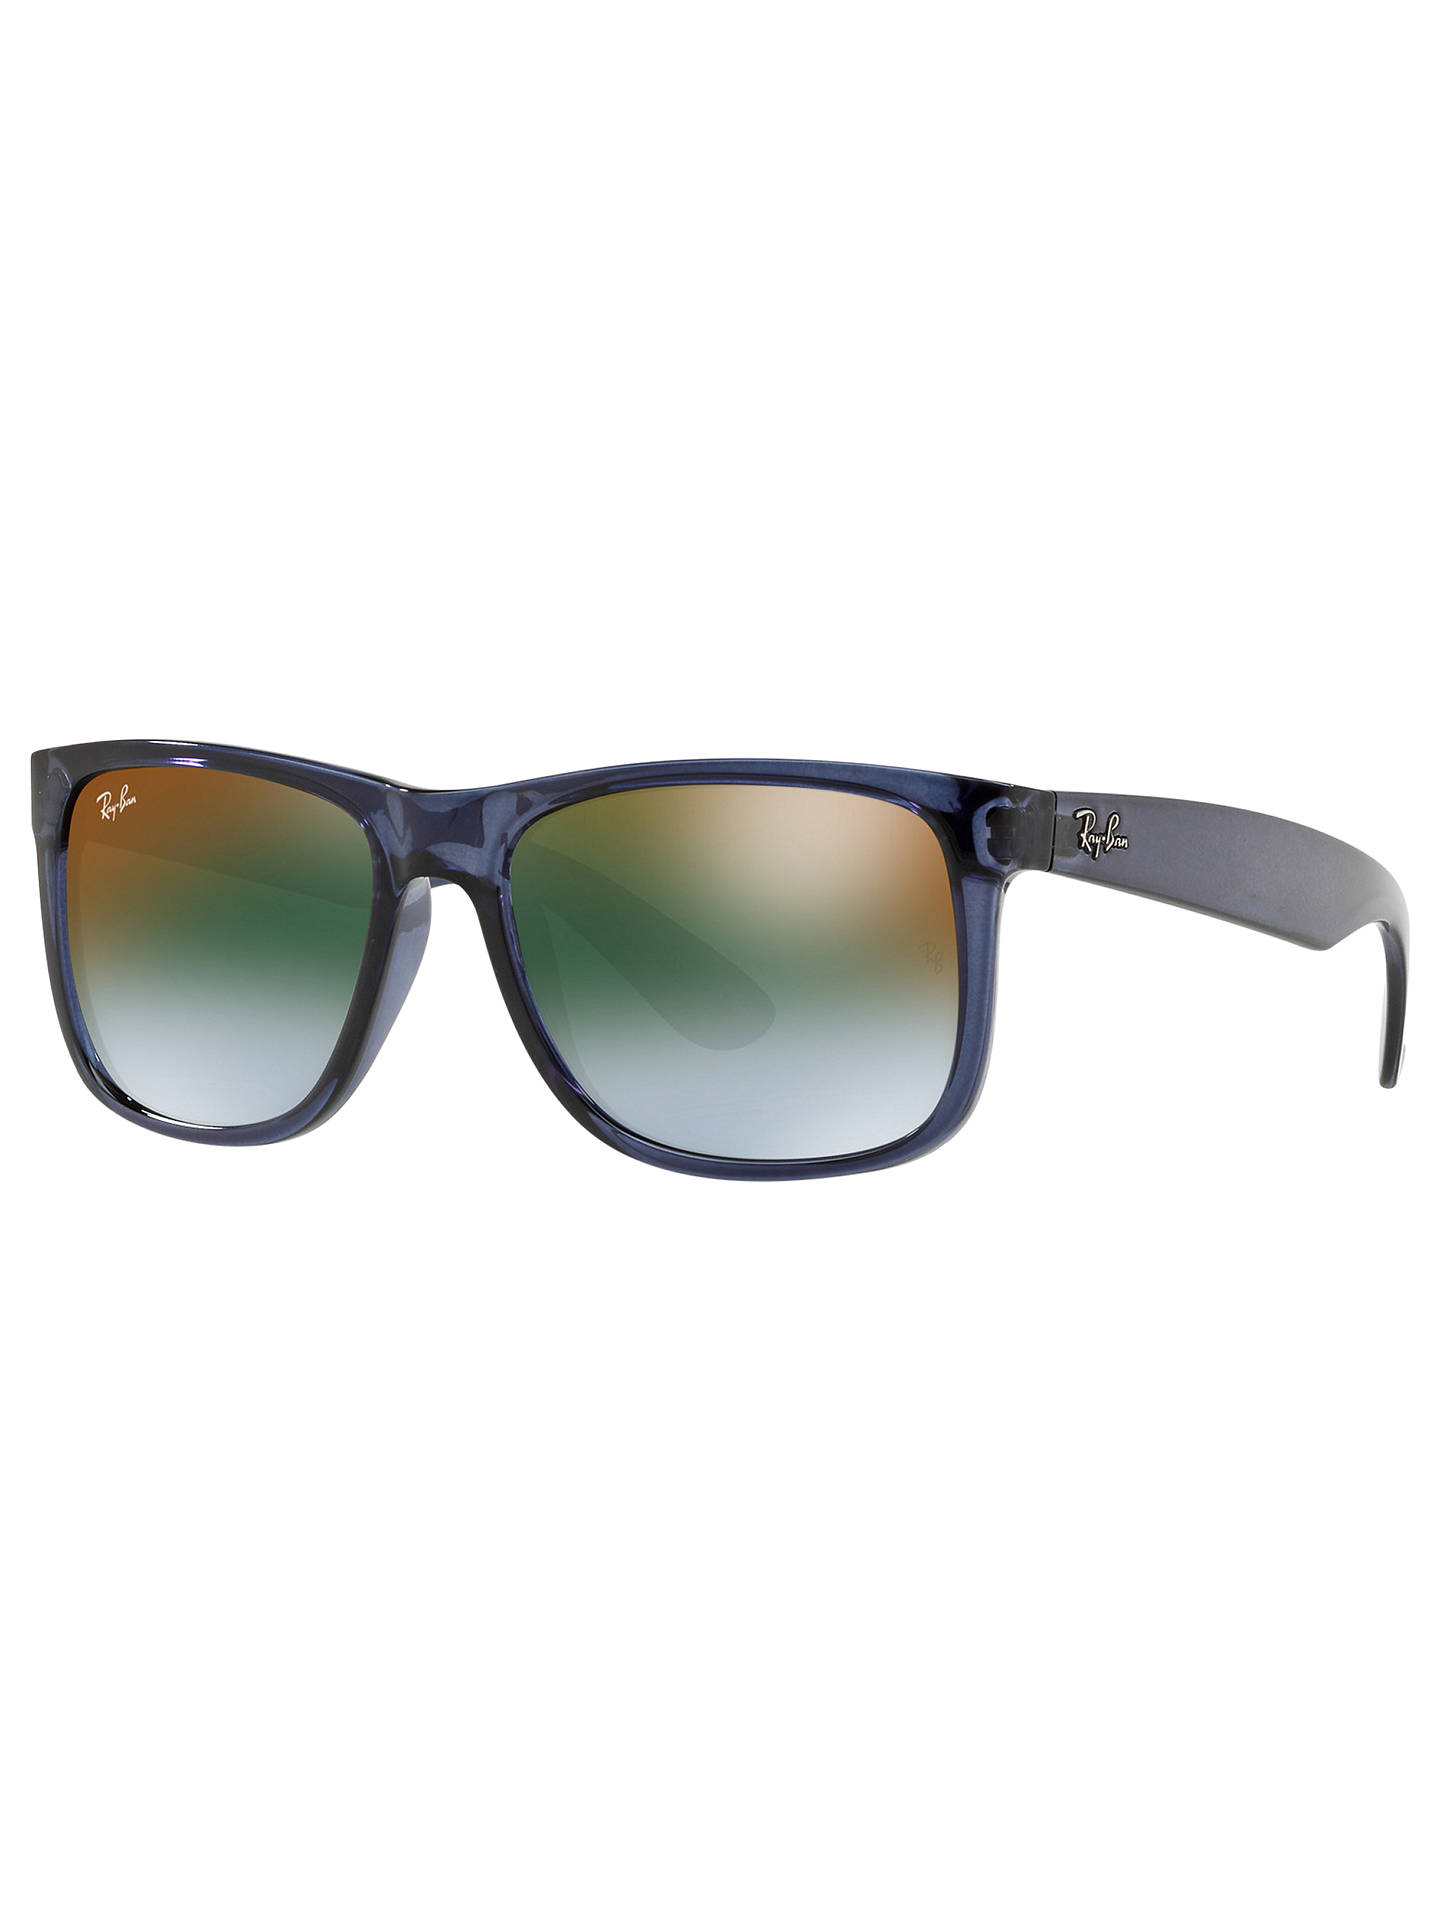 3fb9f031e8 Ray-Ban RB4165 Justin Men s Rectangular Sunglasses at John Lewis ...